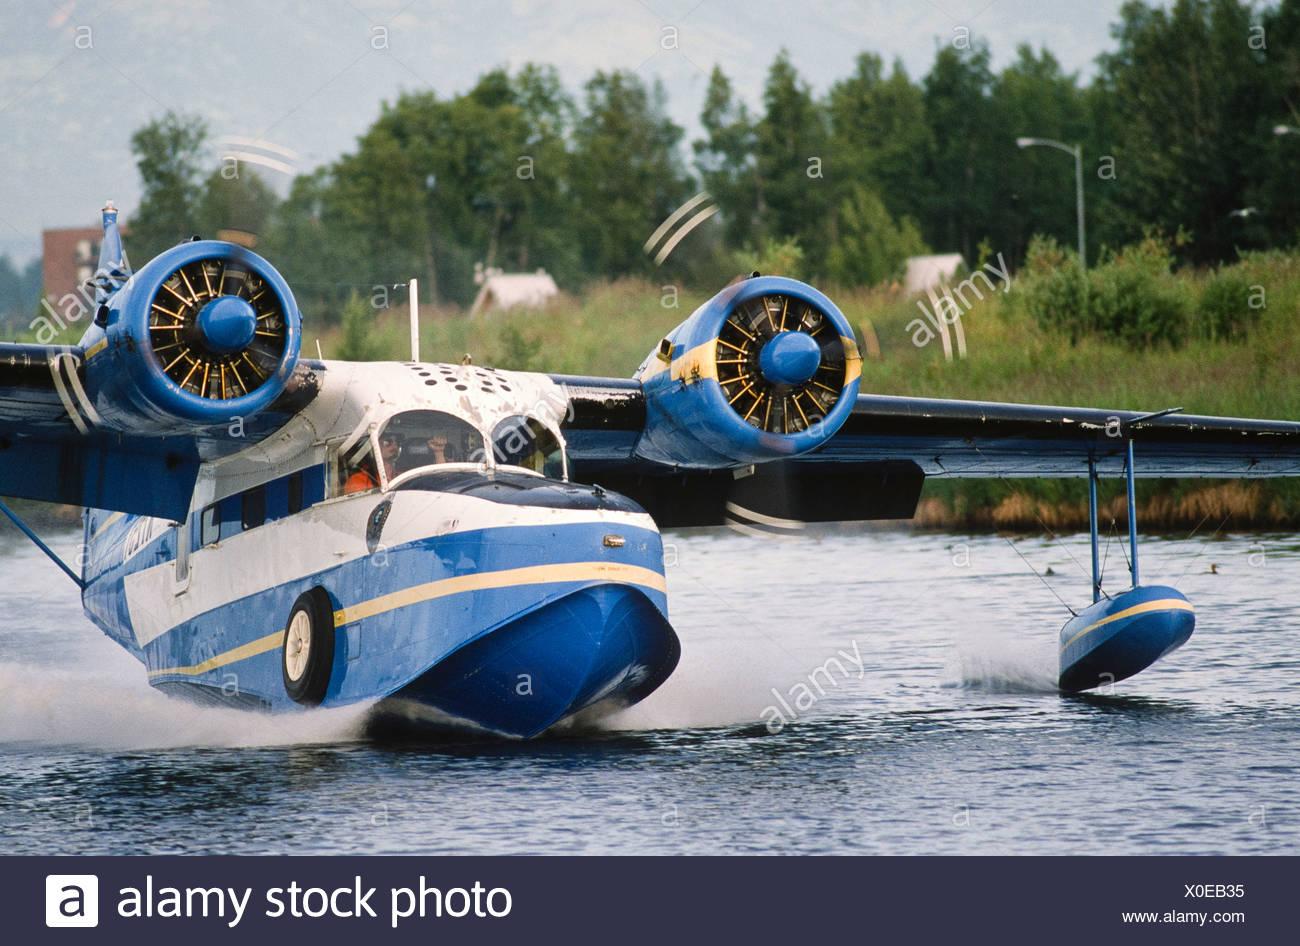 Alaska. Float planes link communities in rural Alaska. Grumman Goose. - Stock Image